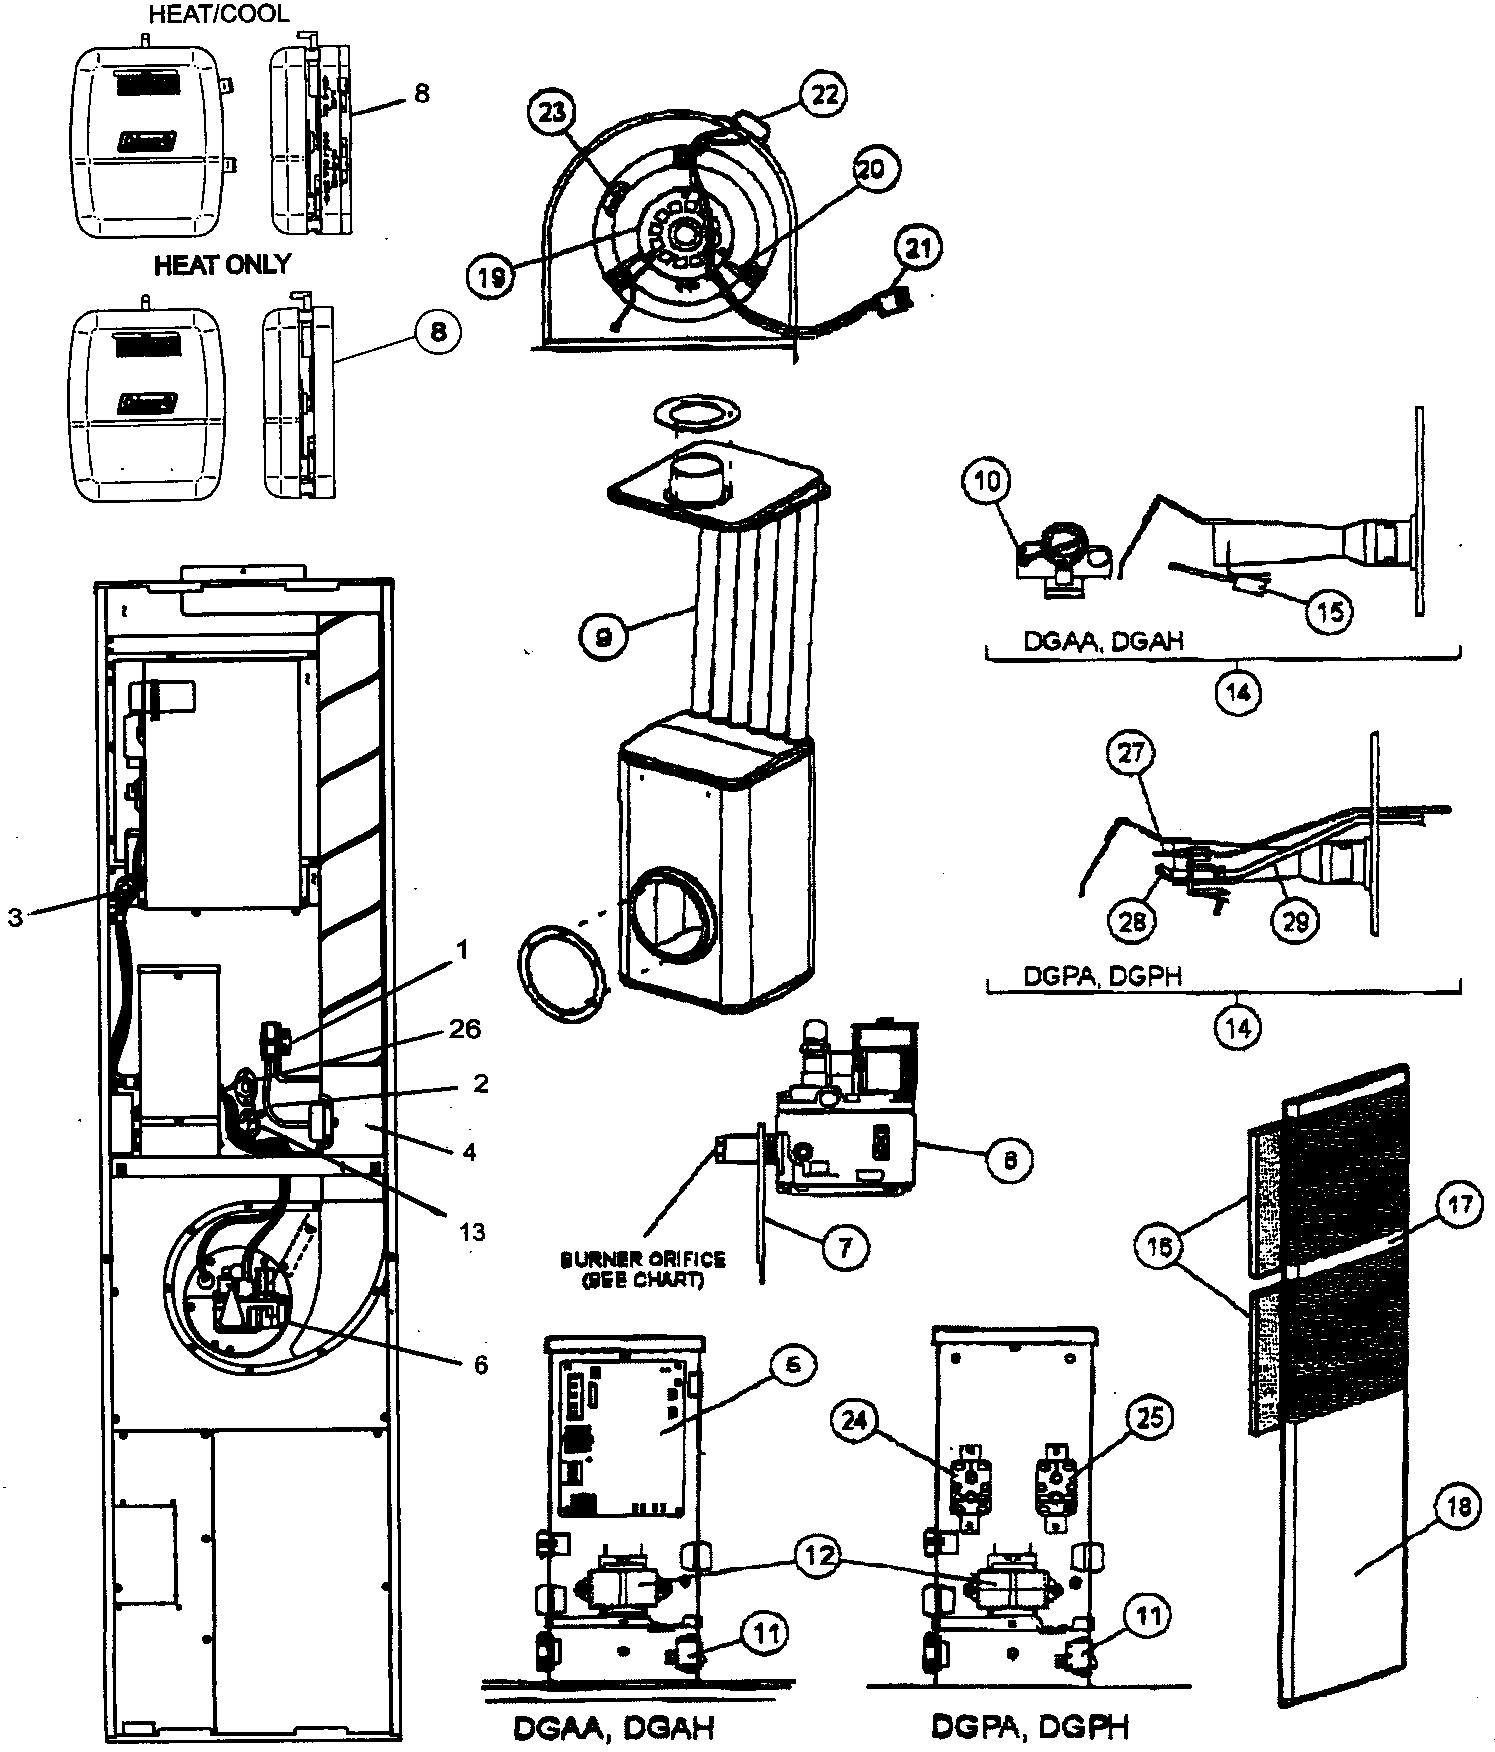 coleman furnace schematics wiring diagram centre coleman gas furnace diagram [ 1495 x 1752 Pixel ]